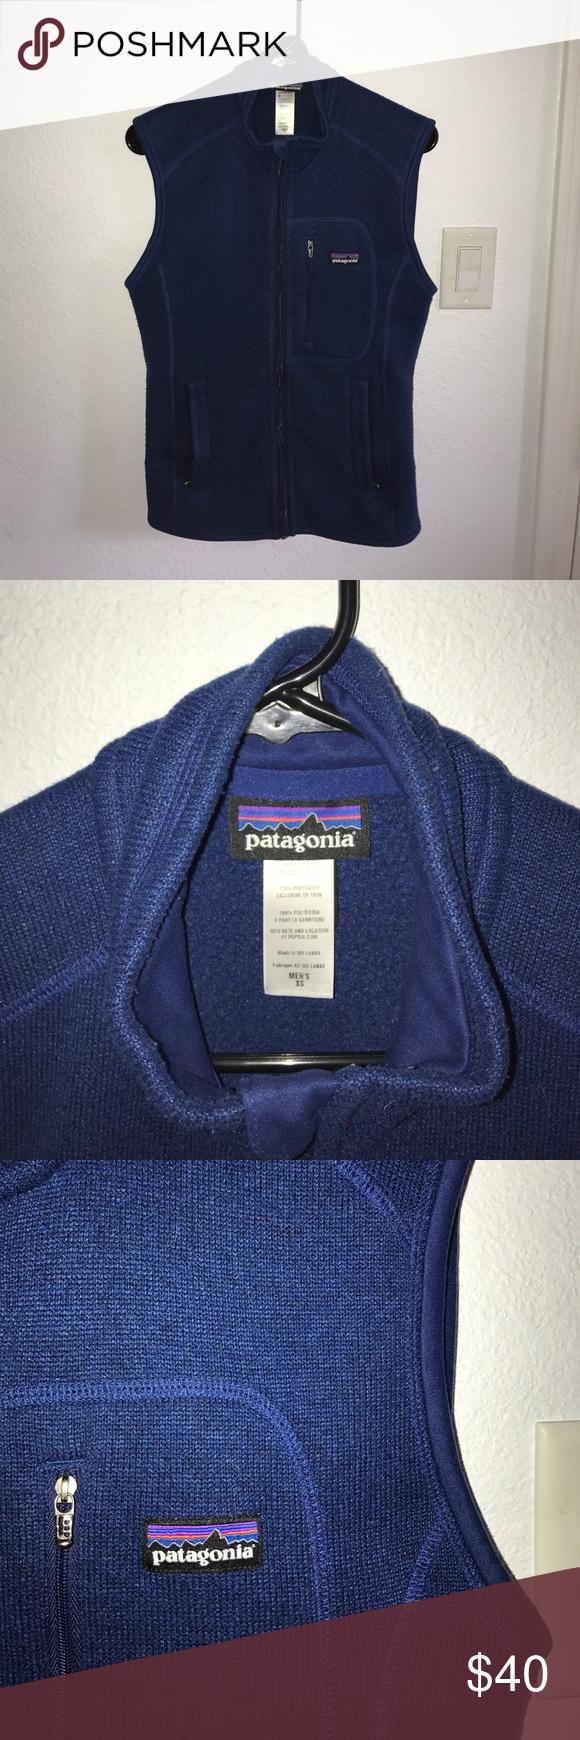 Patagonia Better Sweater Vest! EUC and super cute. 25% BUNDLE DISCOUNT Patagonia Jackets & Coats Vests